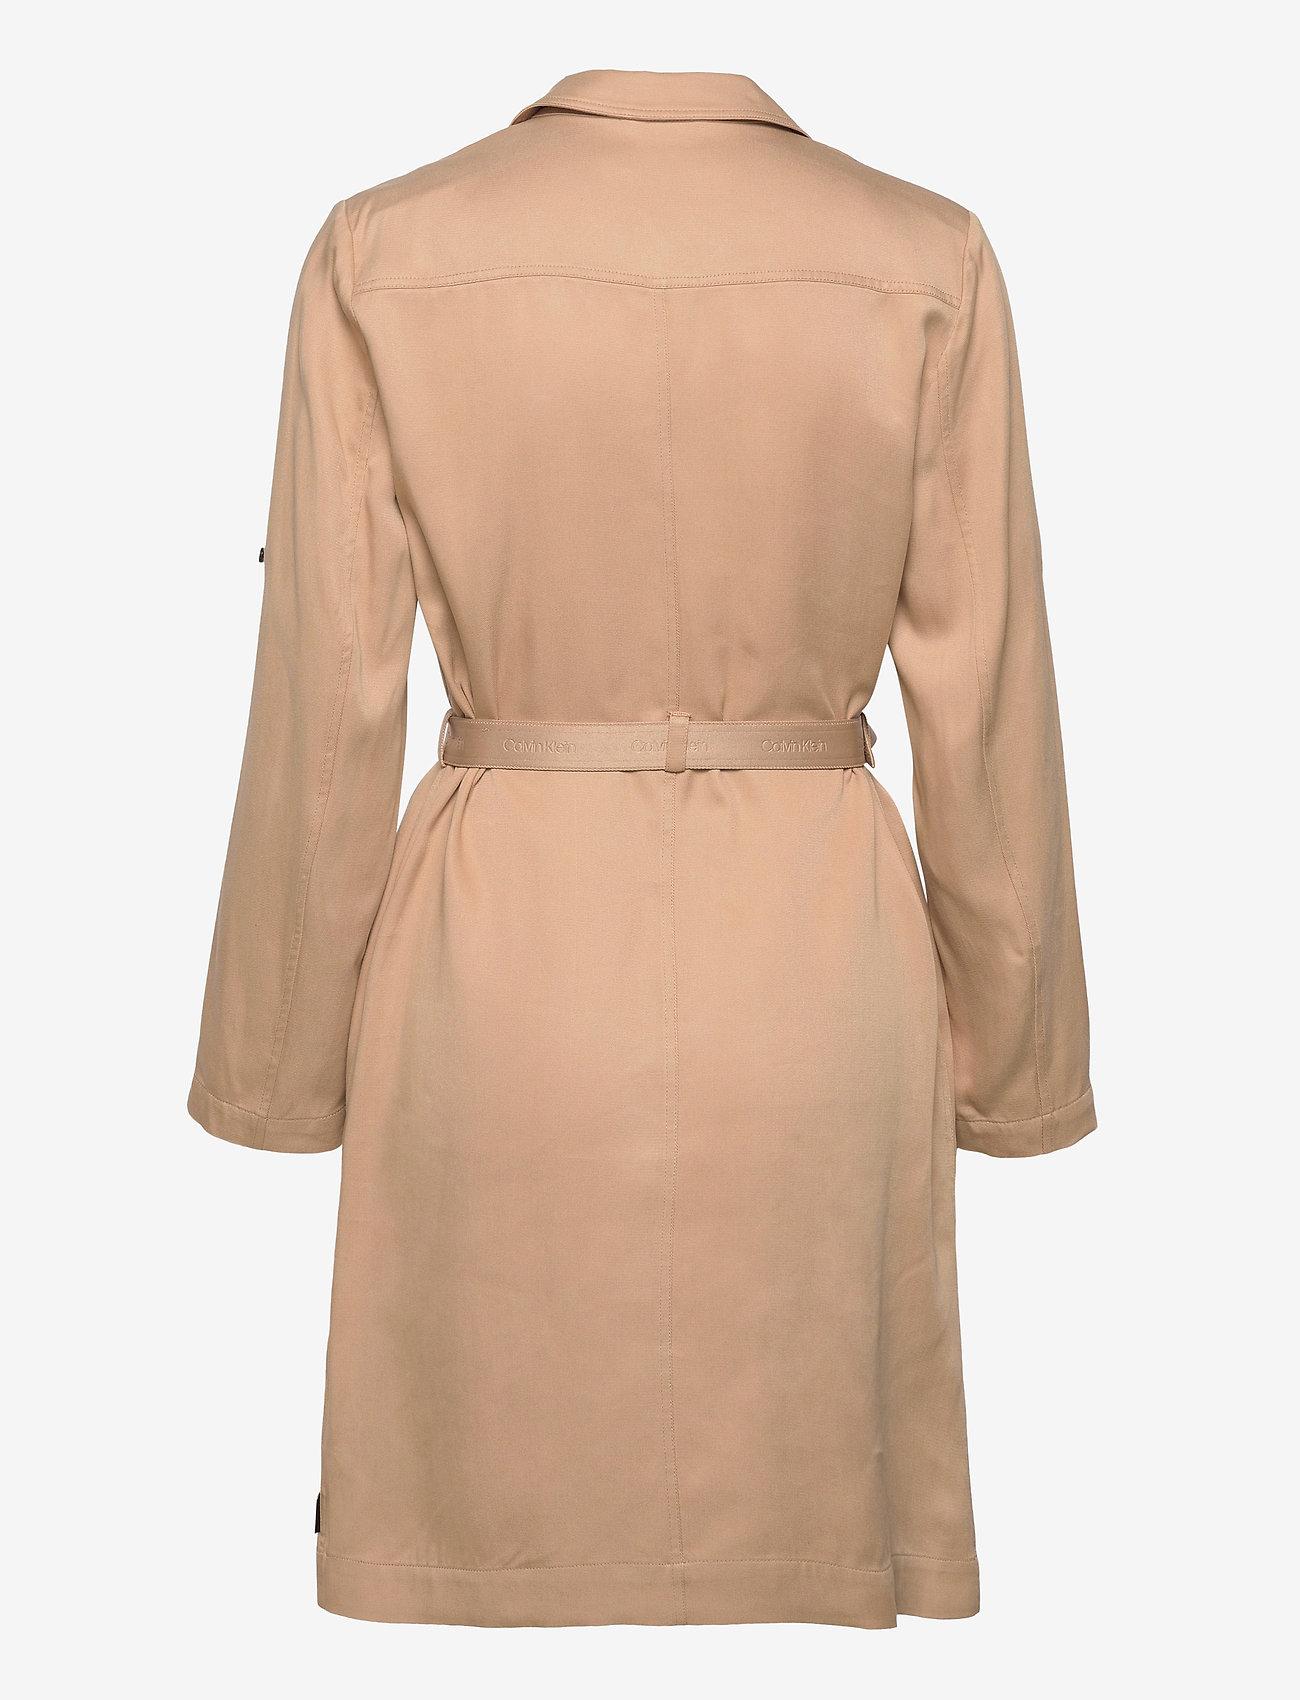 Calvin Klein - TENCEL TRENCH DRESS - trenchcoats - travertine - 1